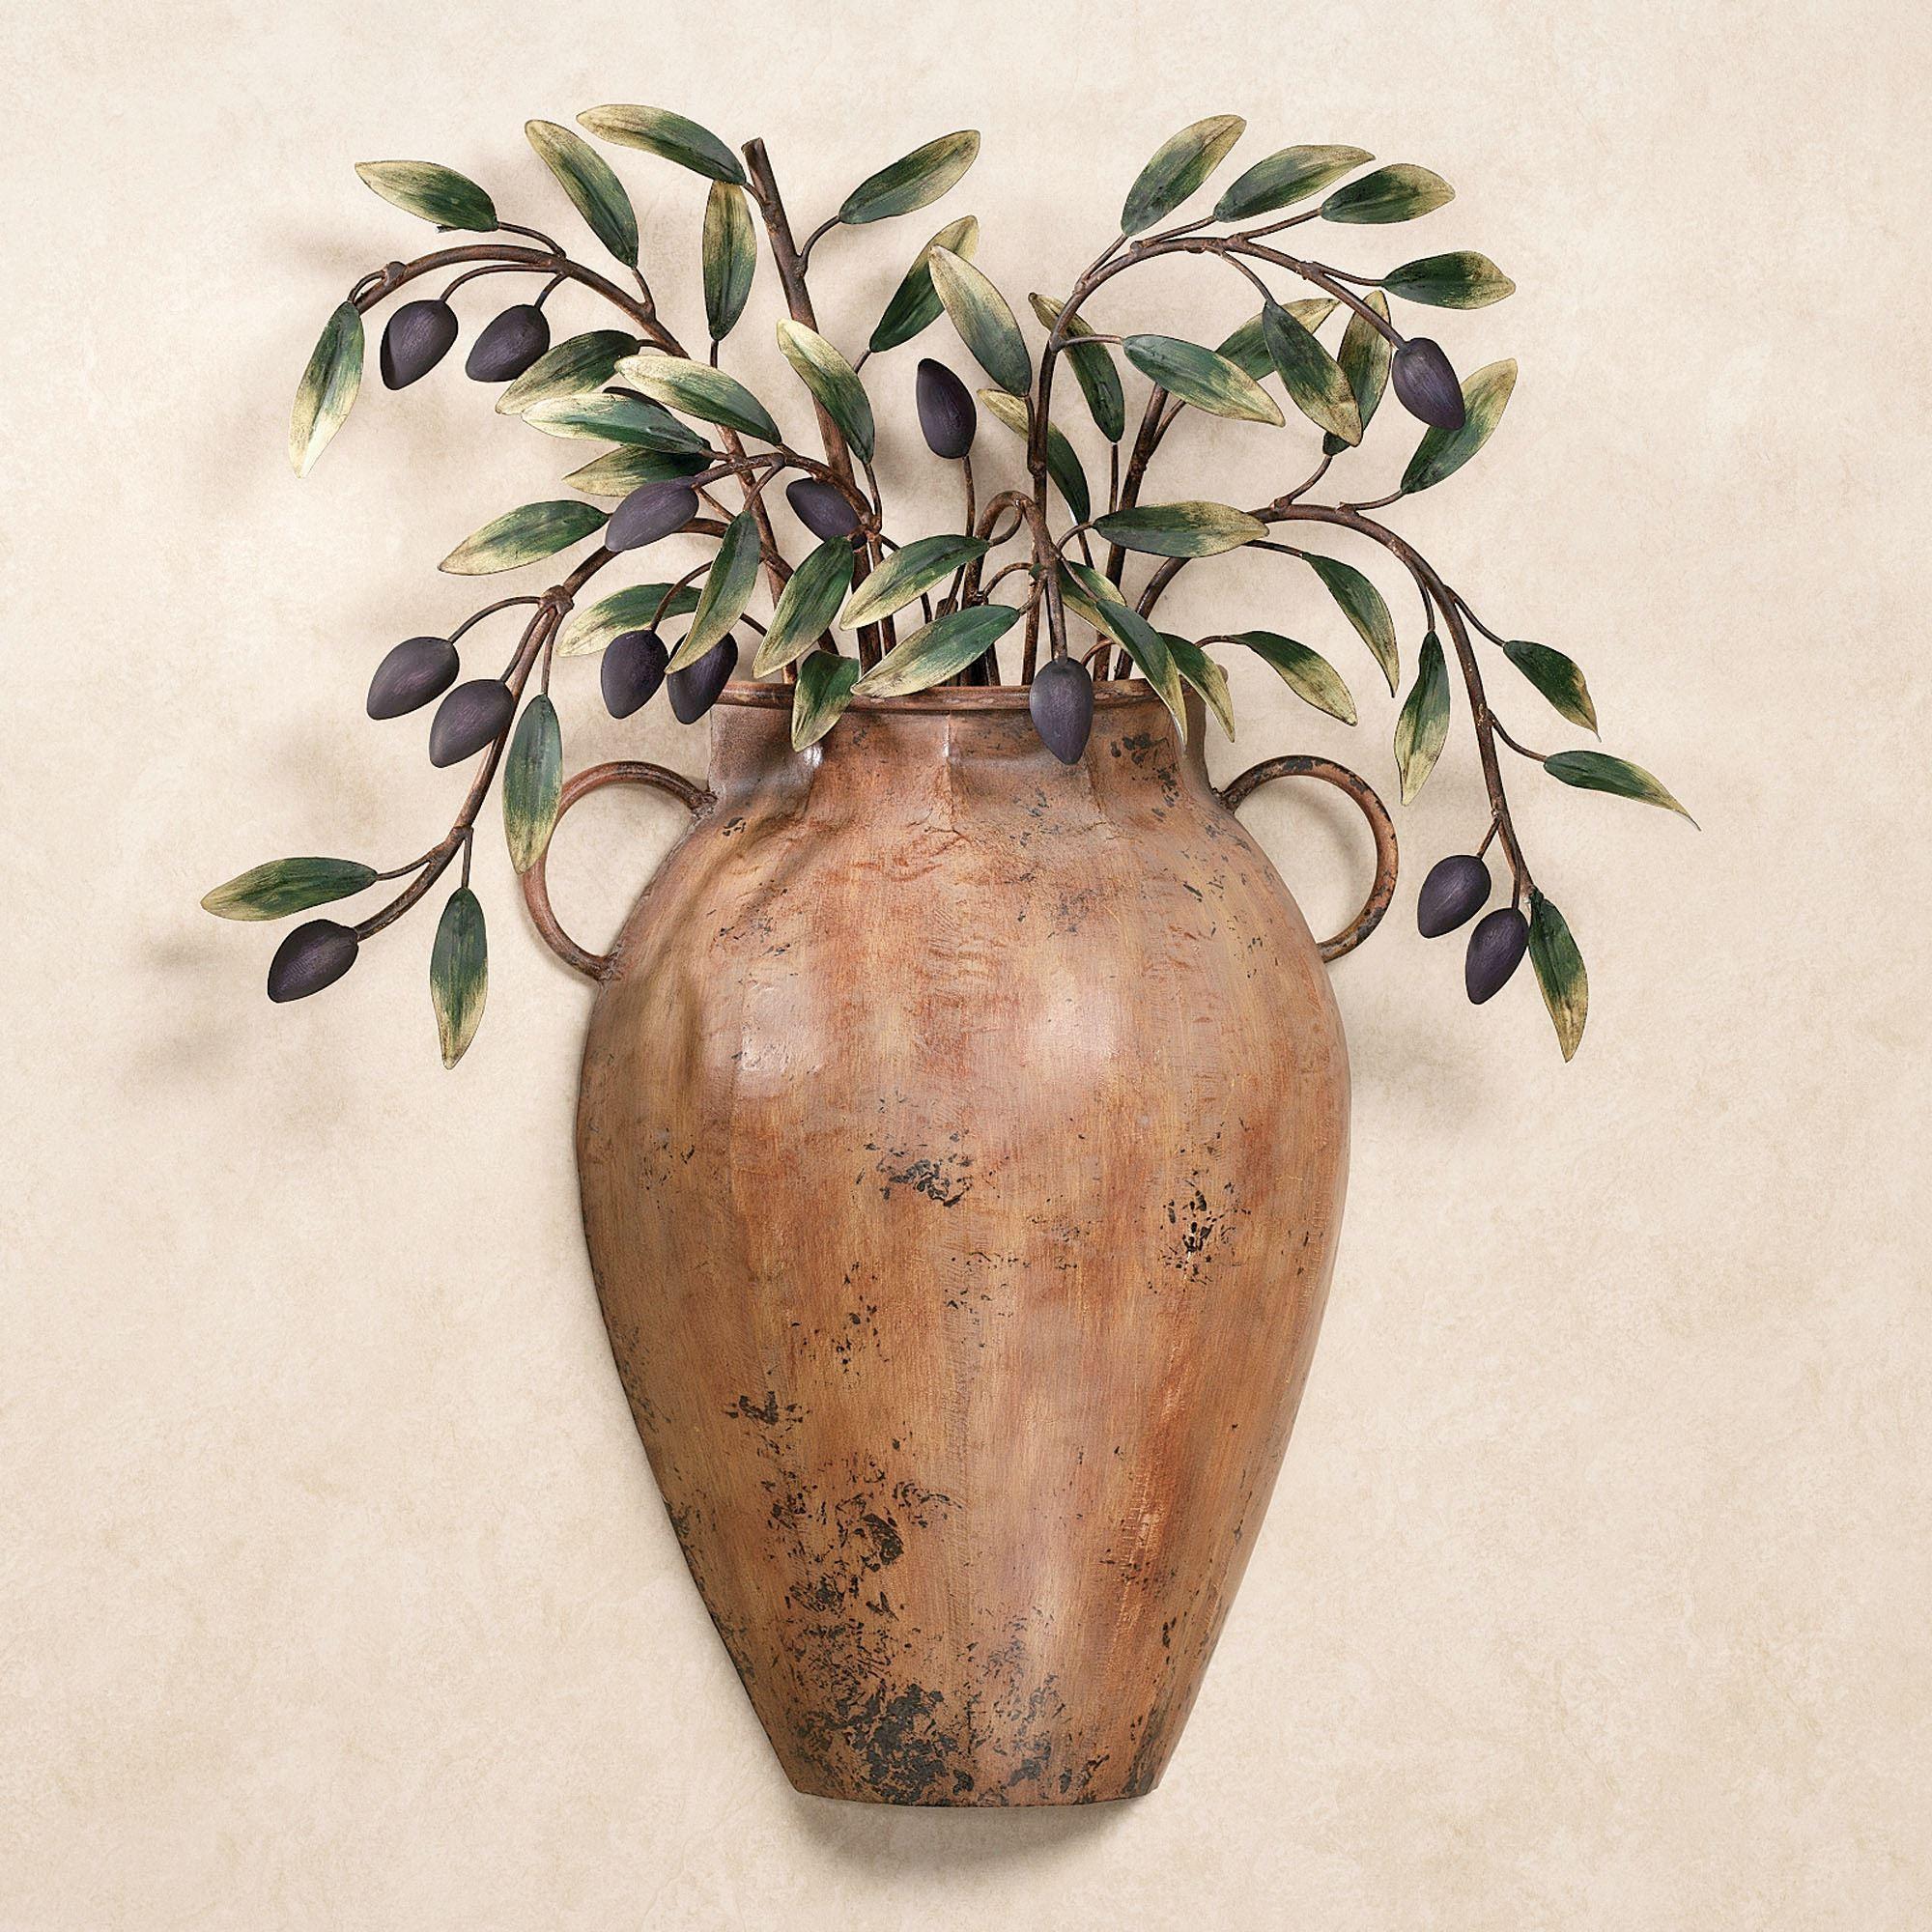 Wall Design: Metal Flower Wall Art Inspirations (Image 17 of 20)